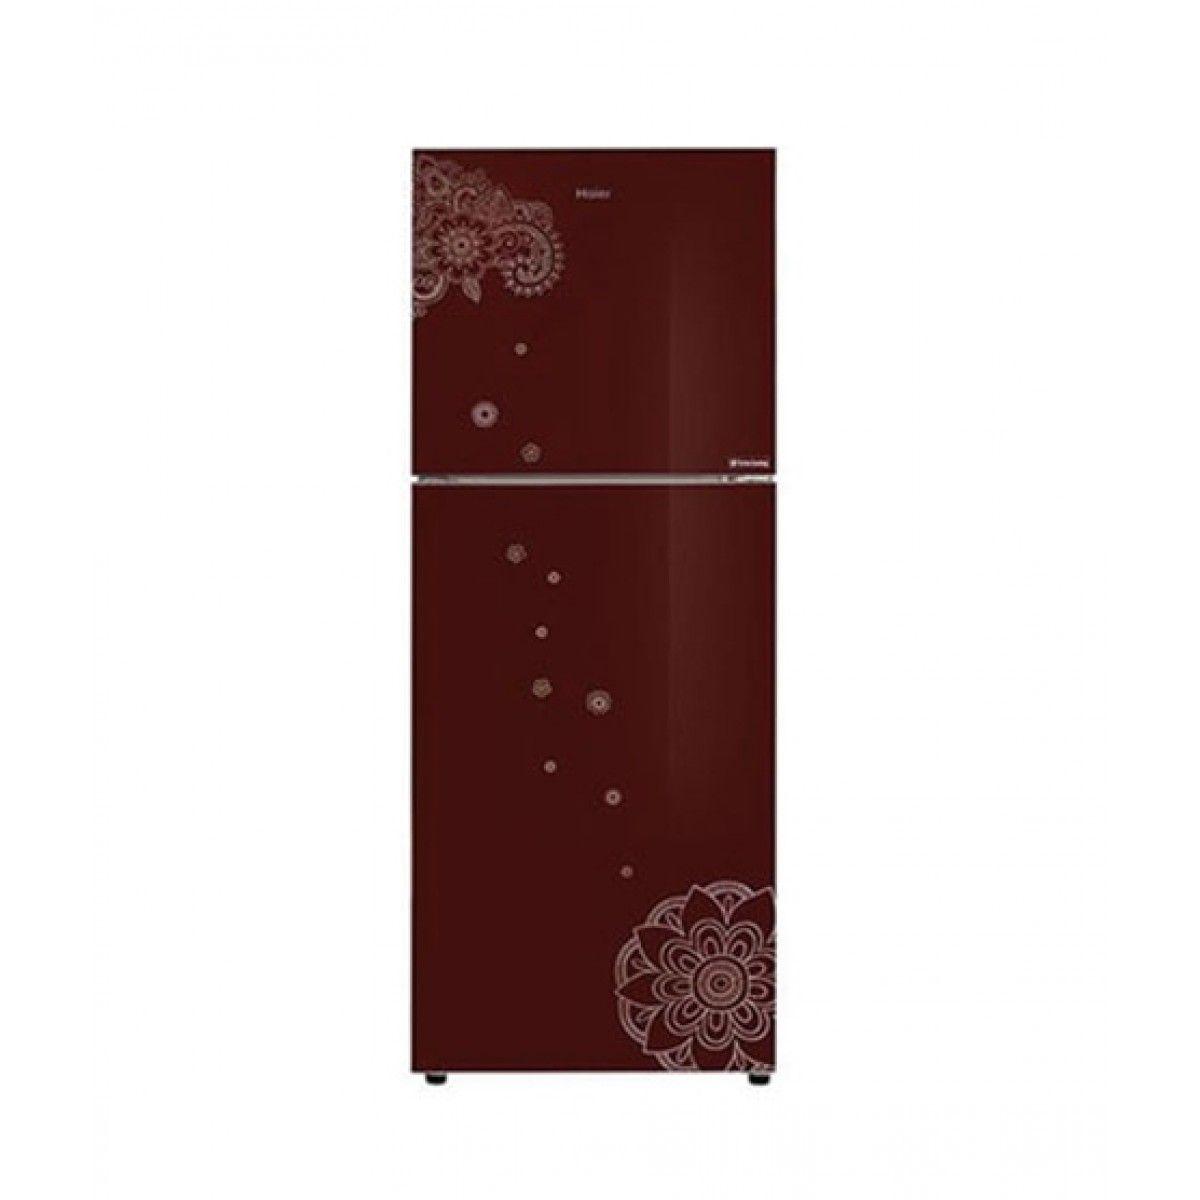 Haier HRF-385-TPR 13 Cu Ft Refrigerator